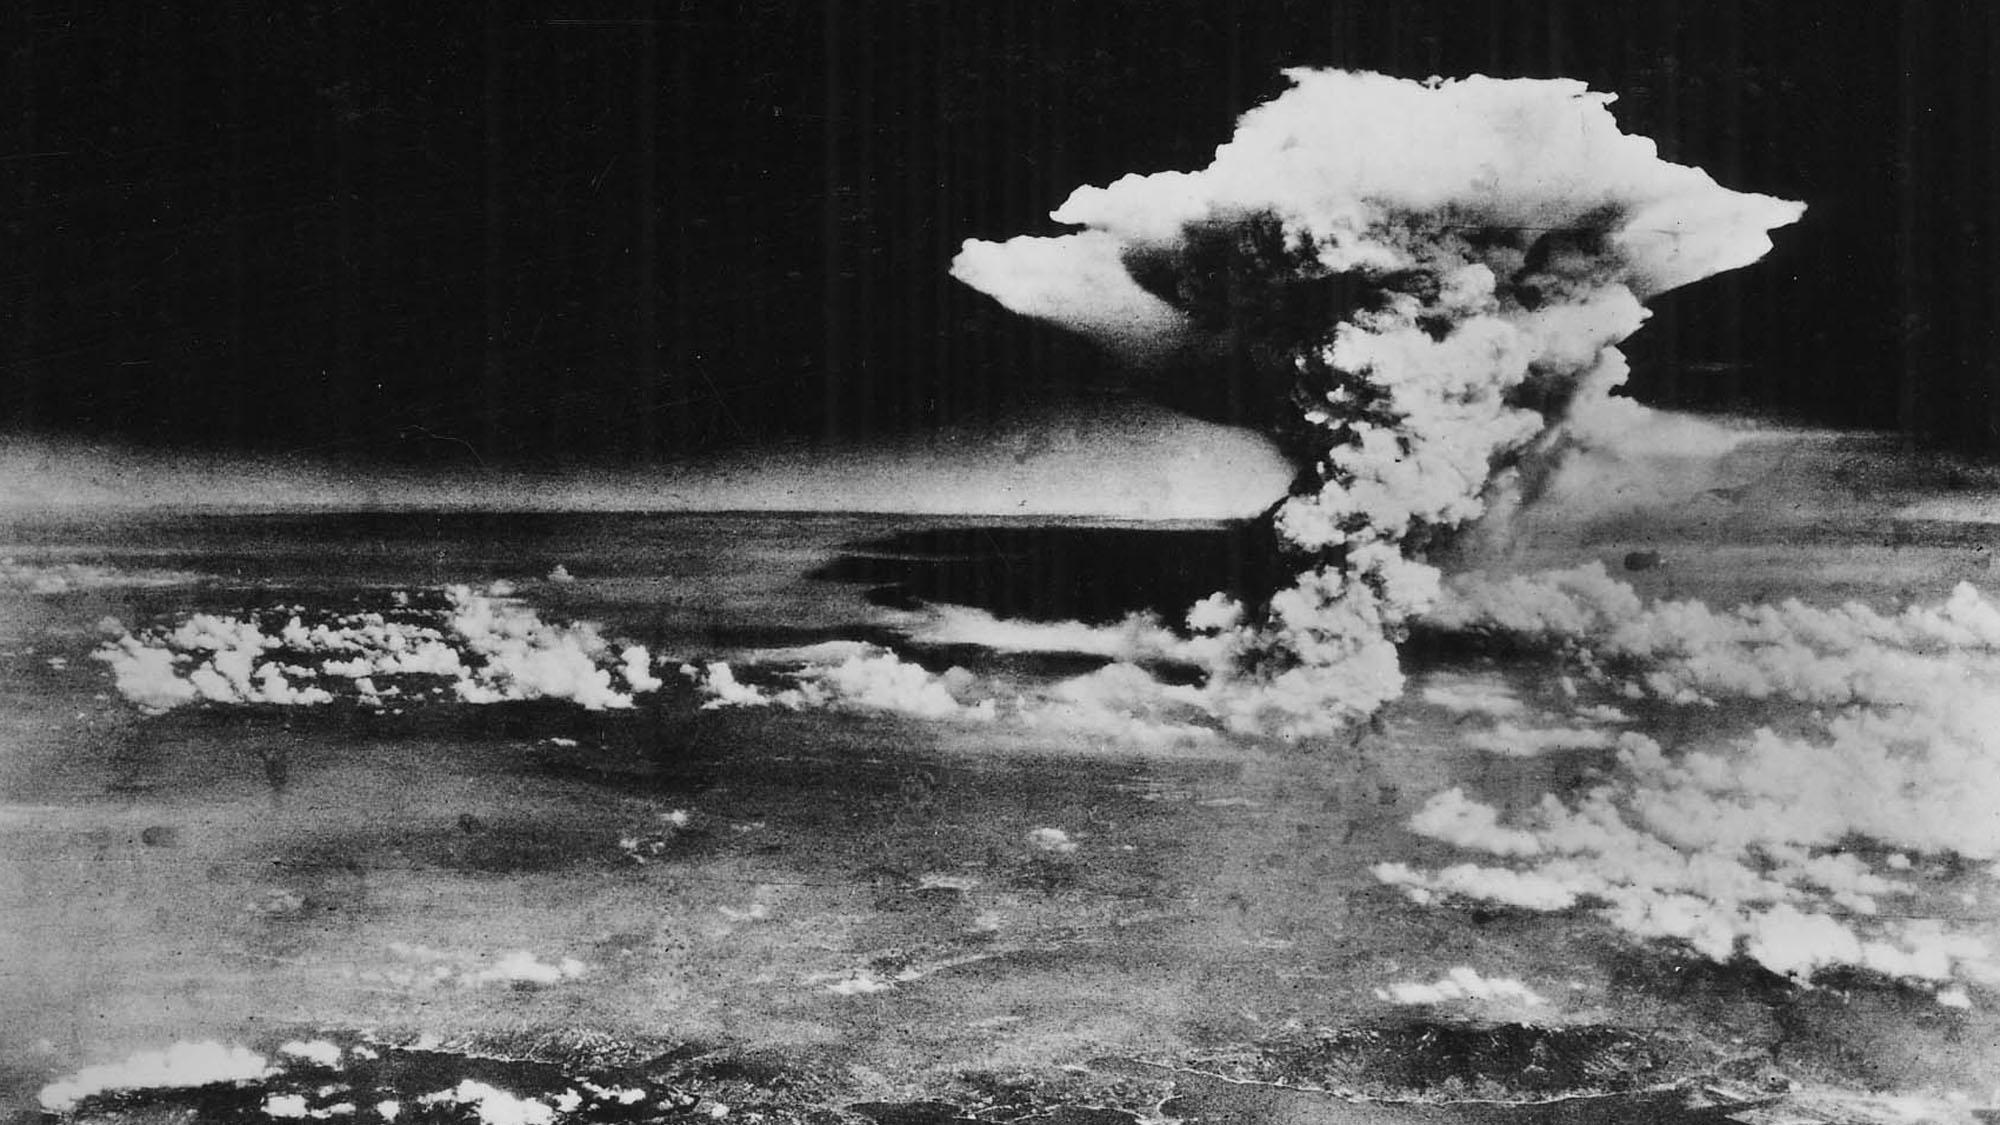 The mushroom cloud over Hiroshima. Image courtesy wikimedia.org,